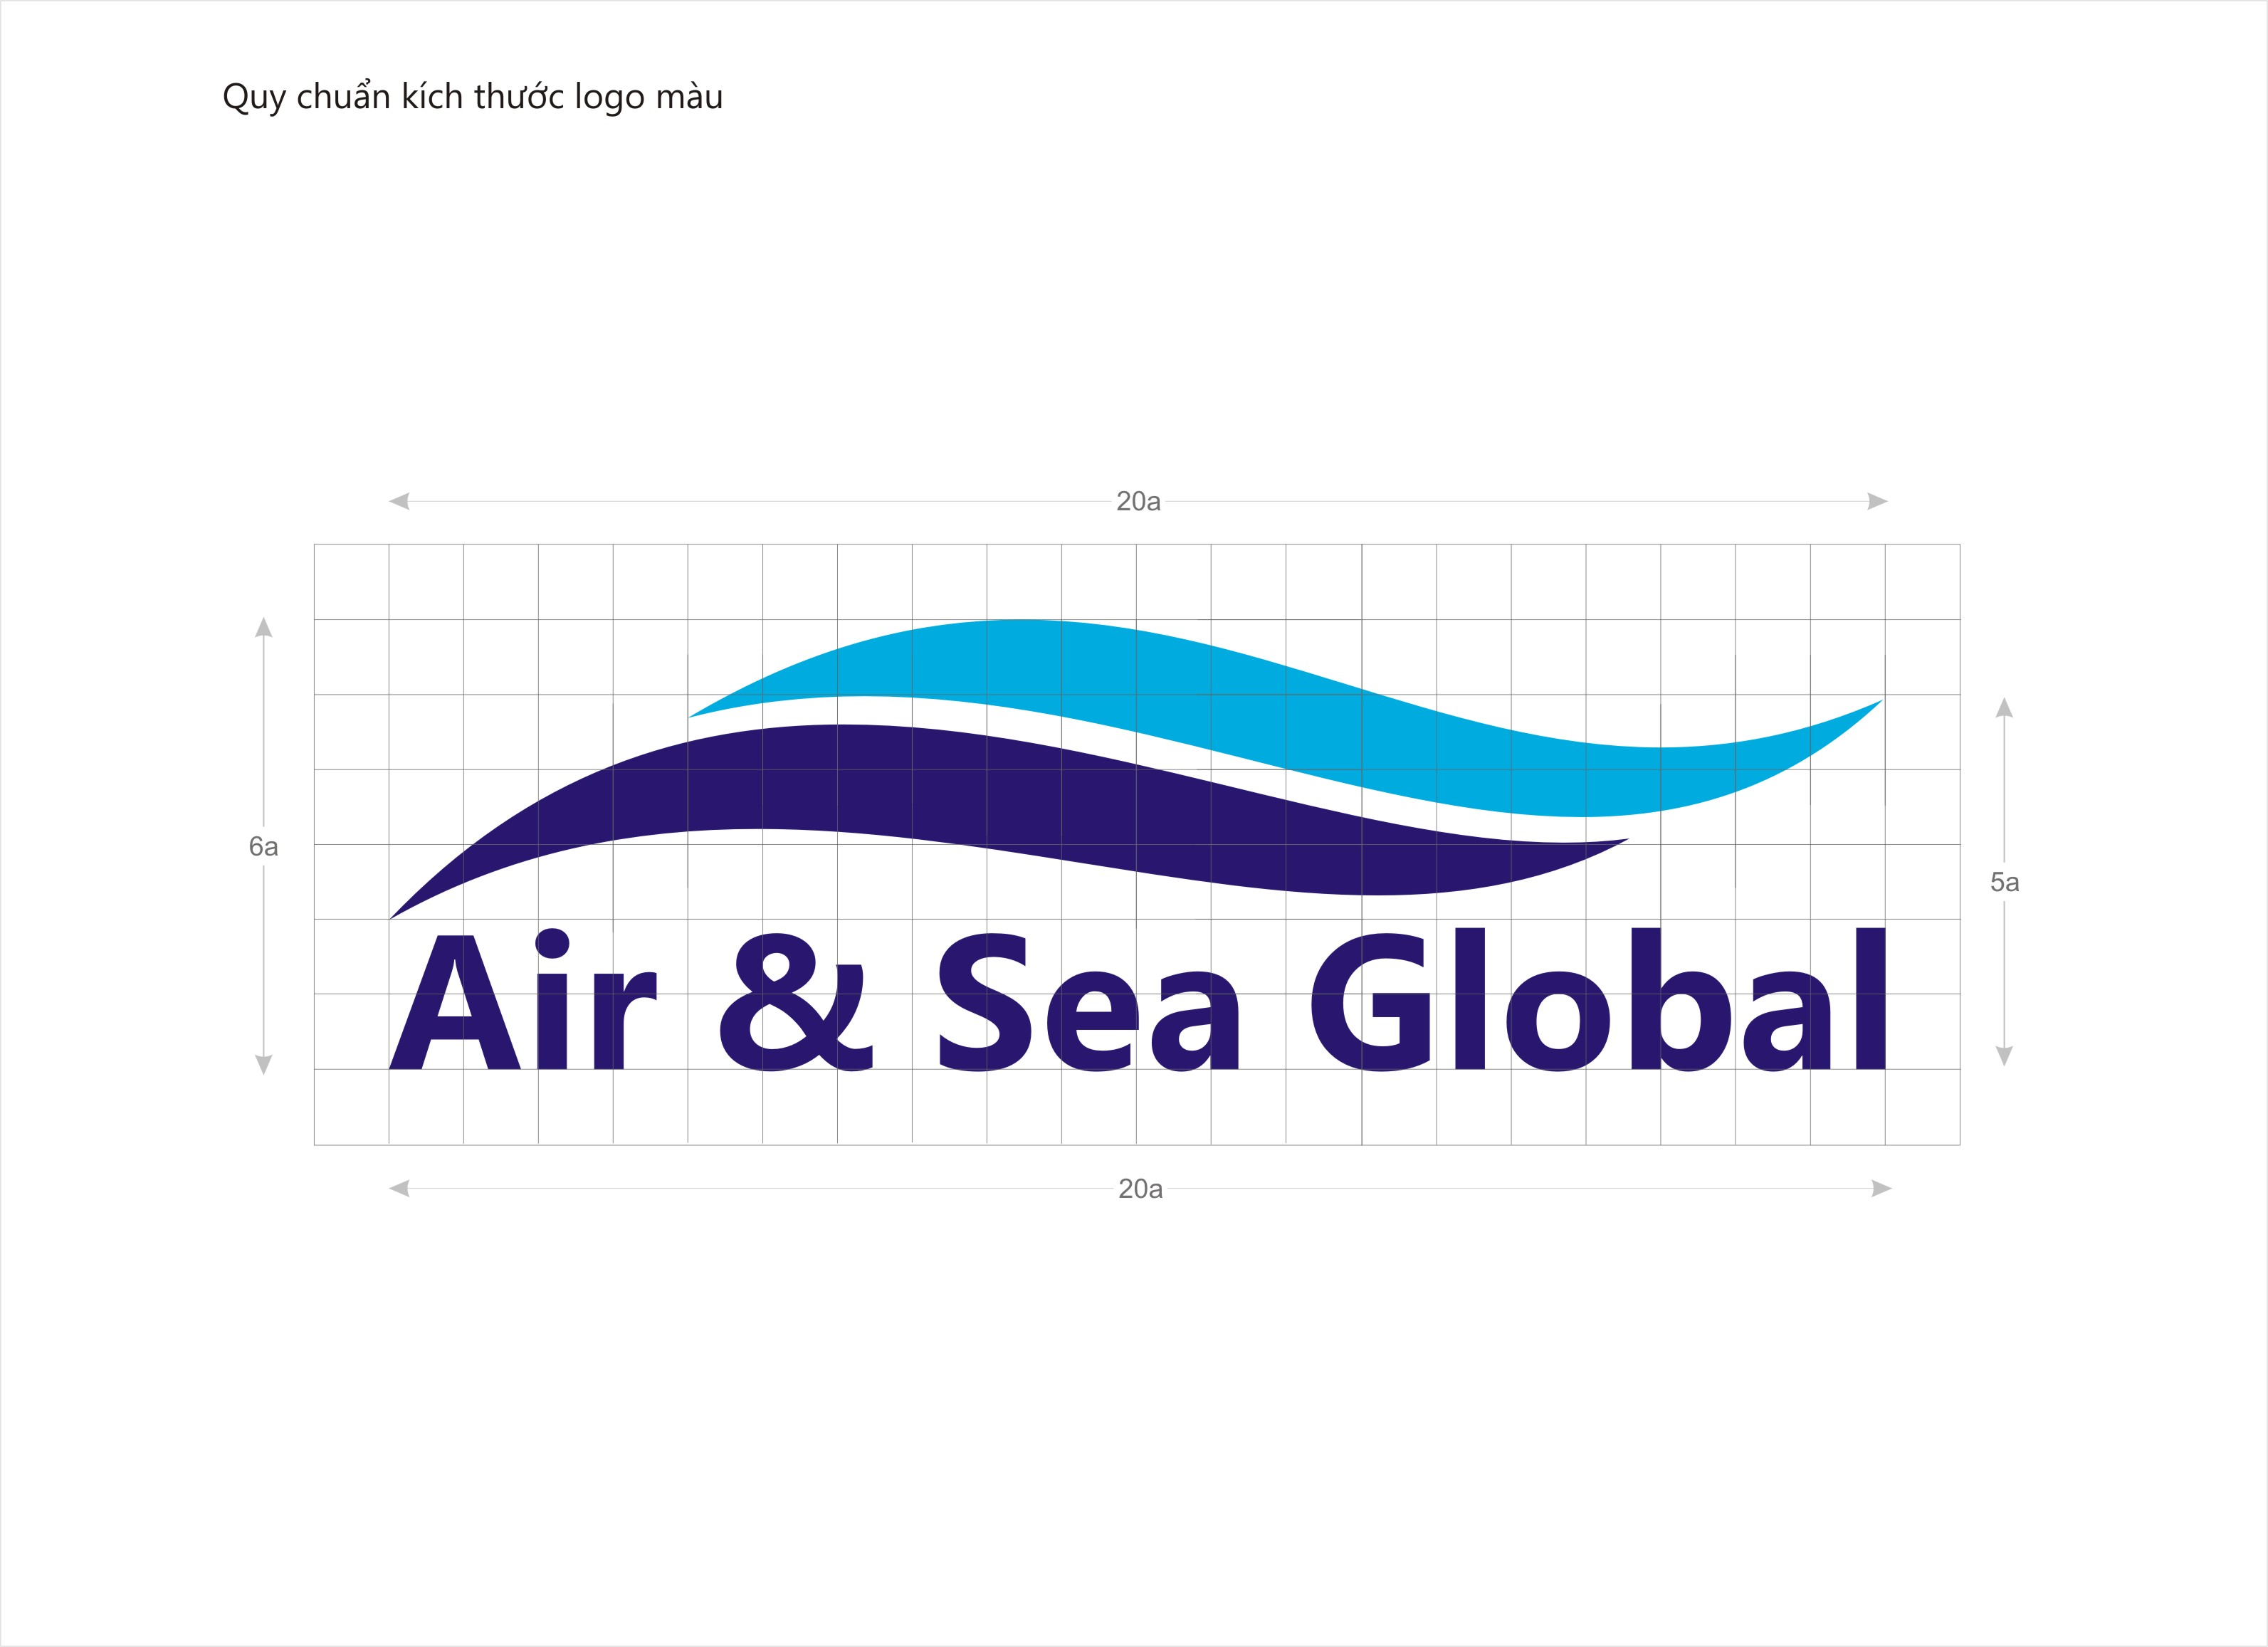 Giới thiệu công ty AIR & SEA GLOBAL